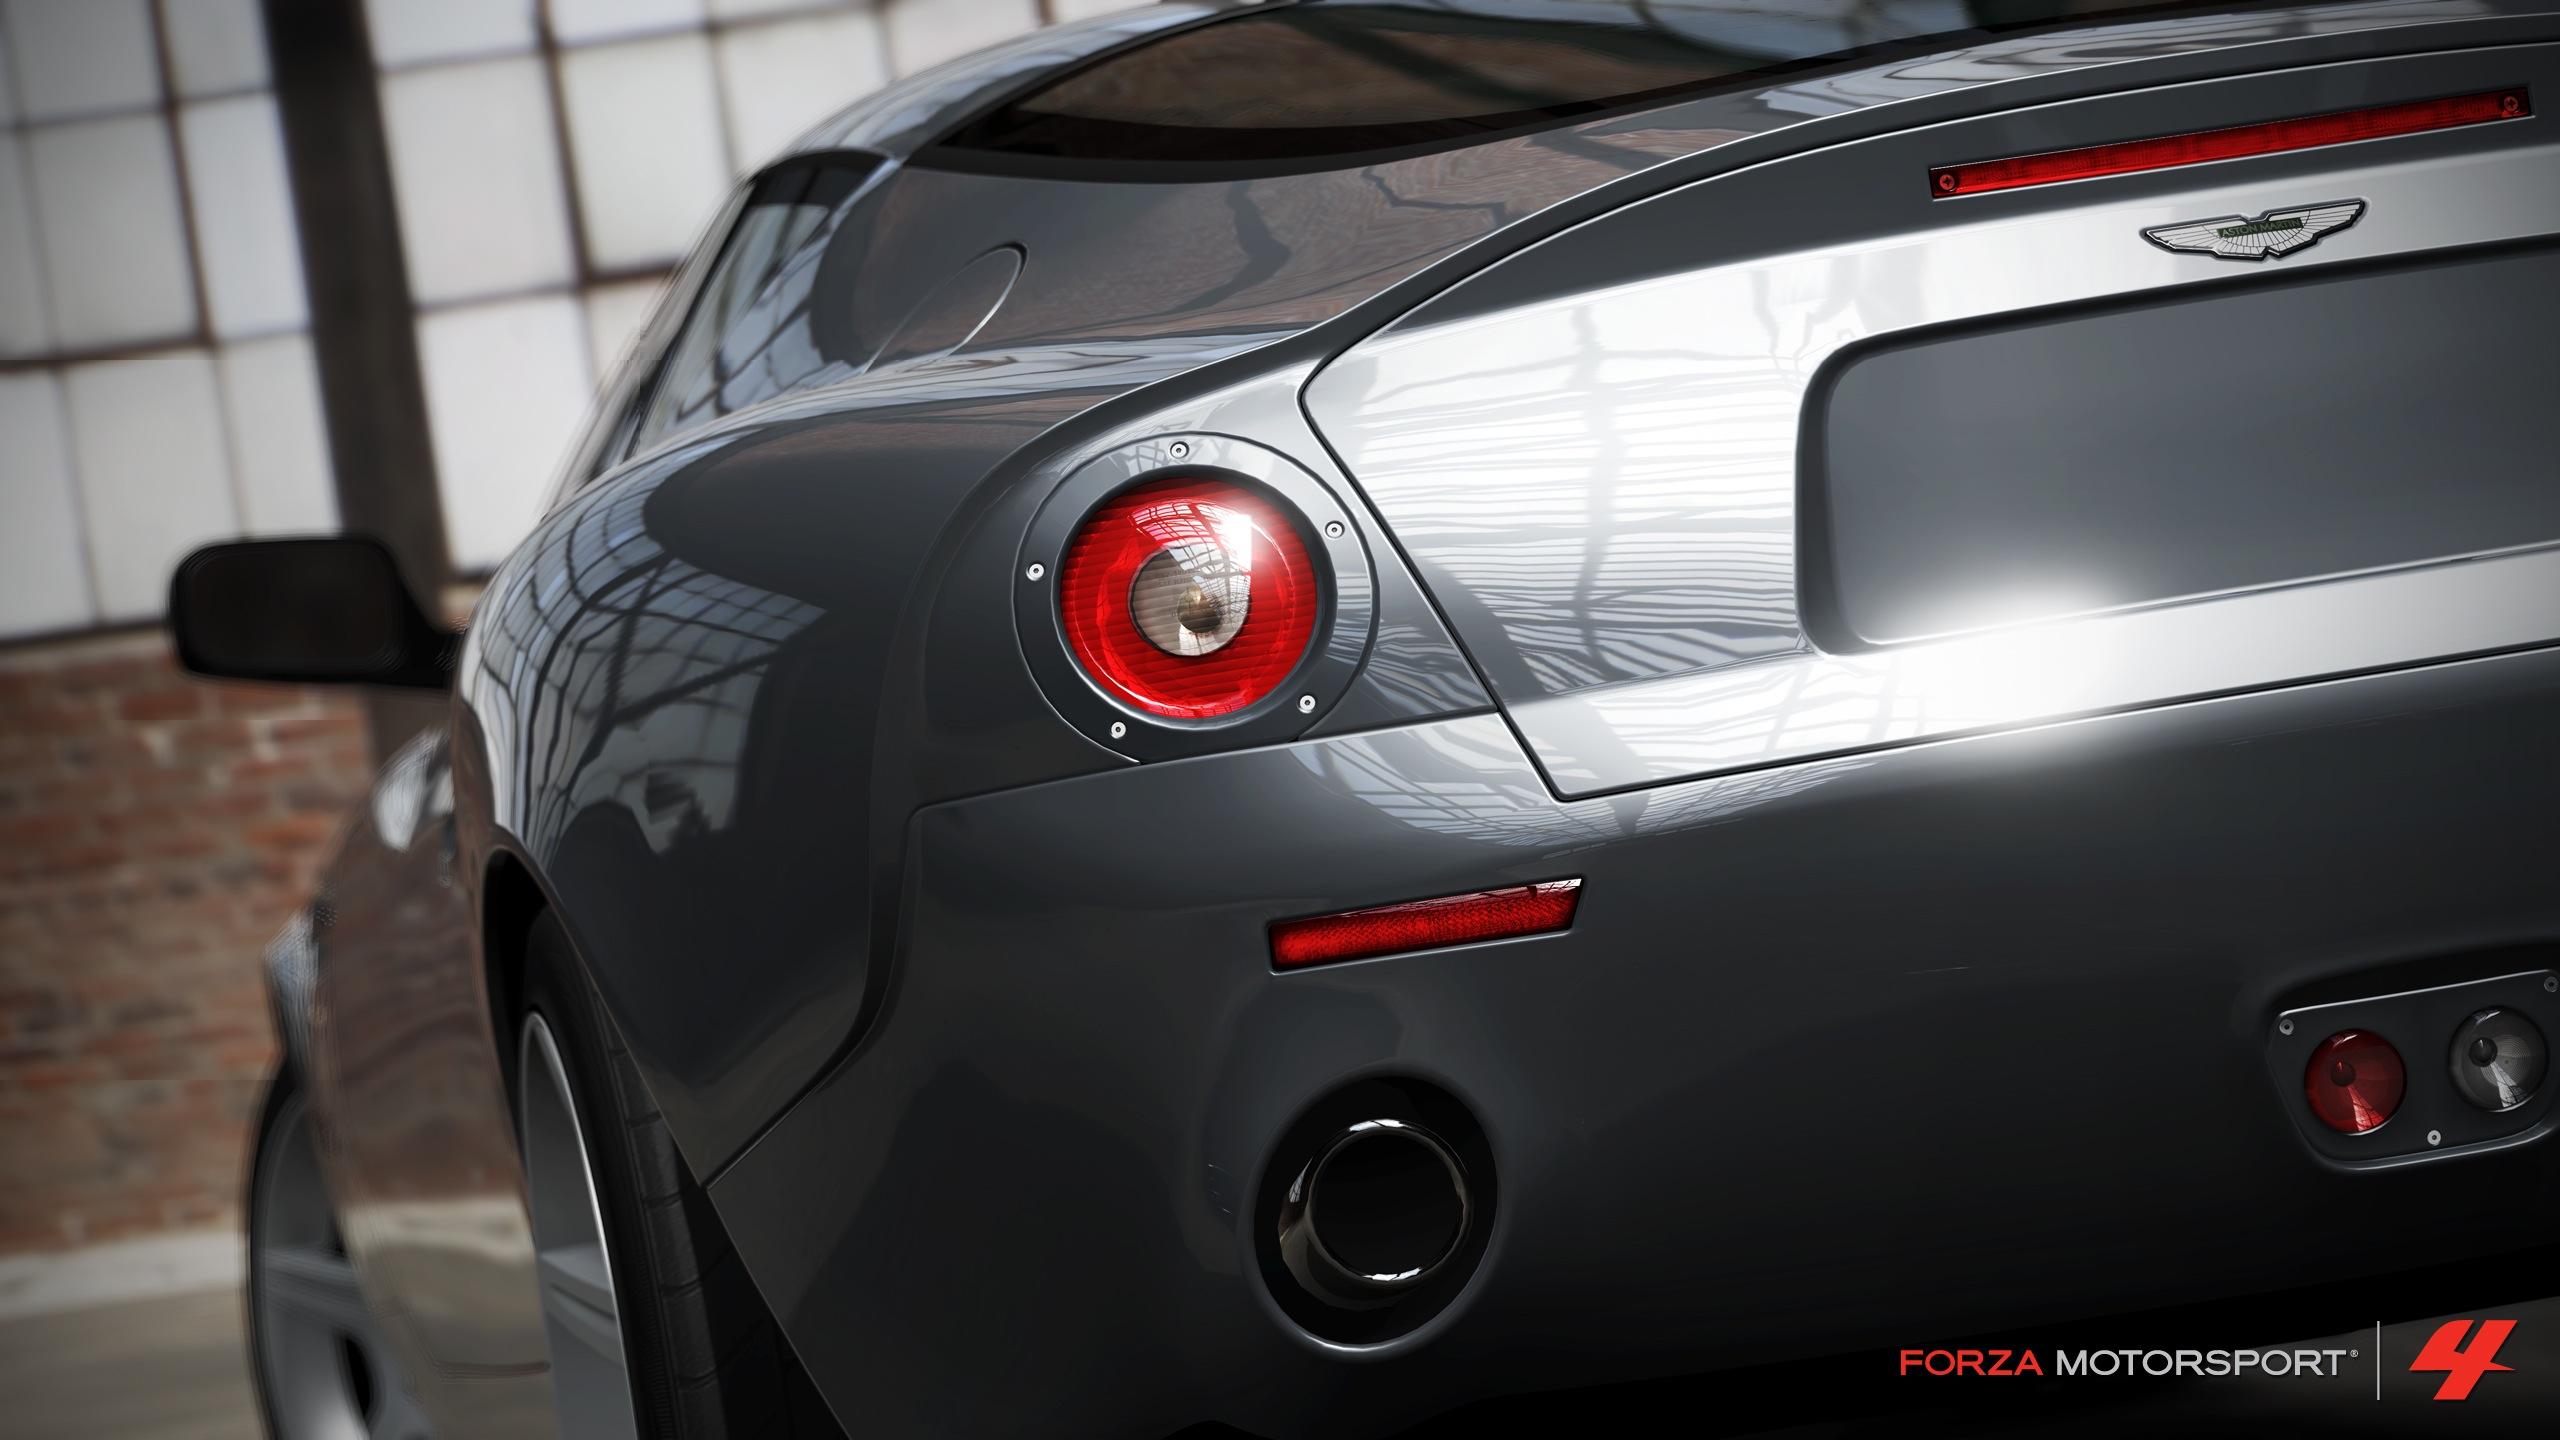 Aston Martin Db7 Zagato Forza Wiki Fandom